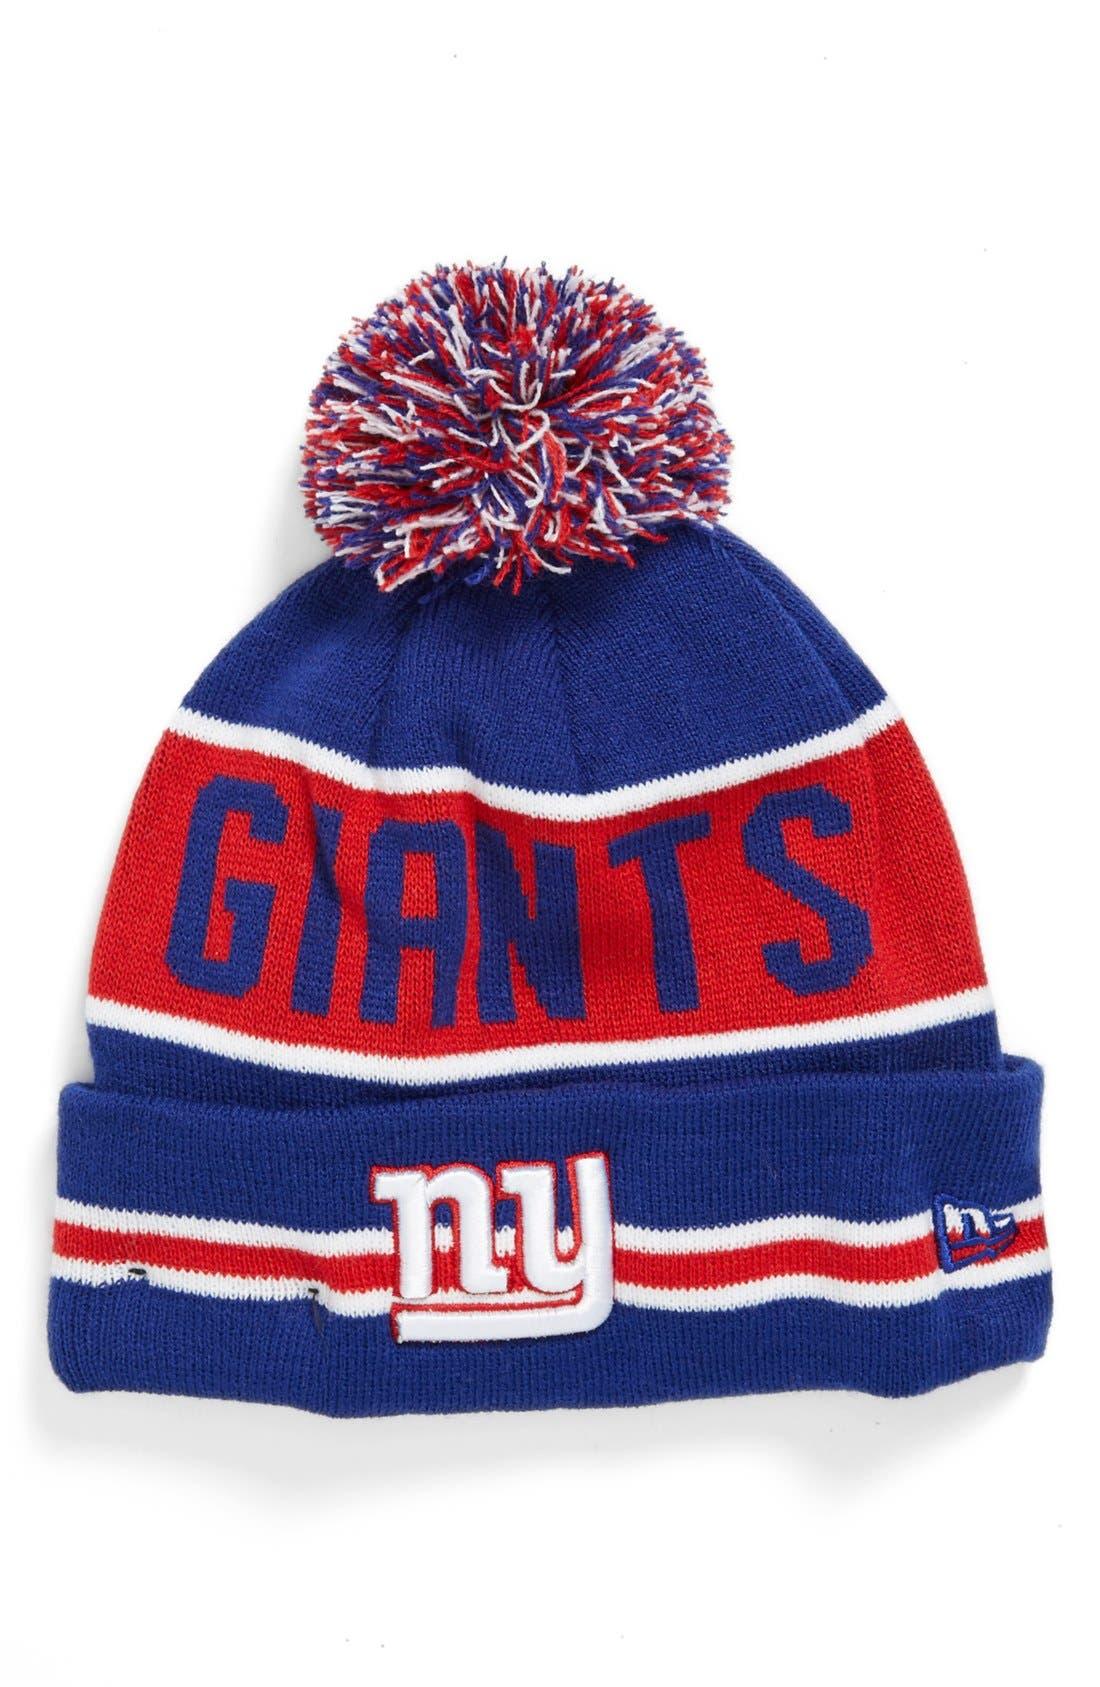 Alternate Image 1 Selected - New Era Cap 'The Coach - New York Giants' Knit Cap